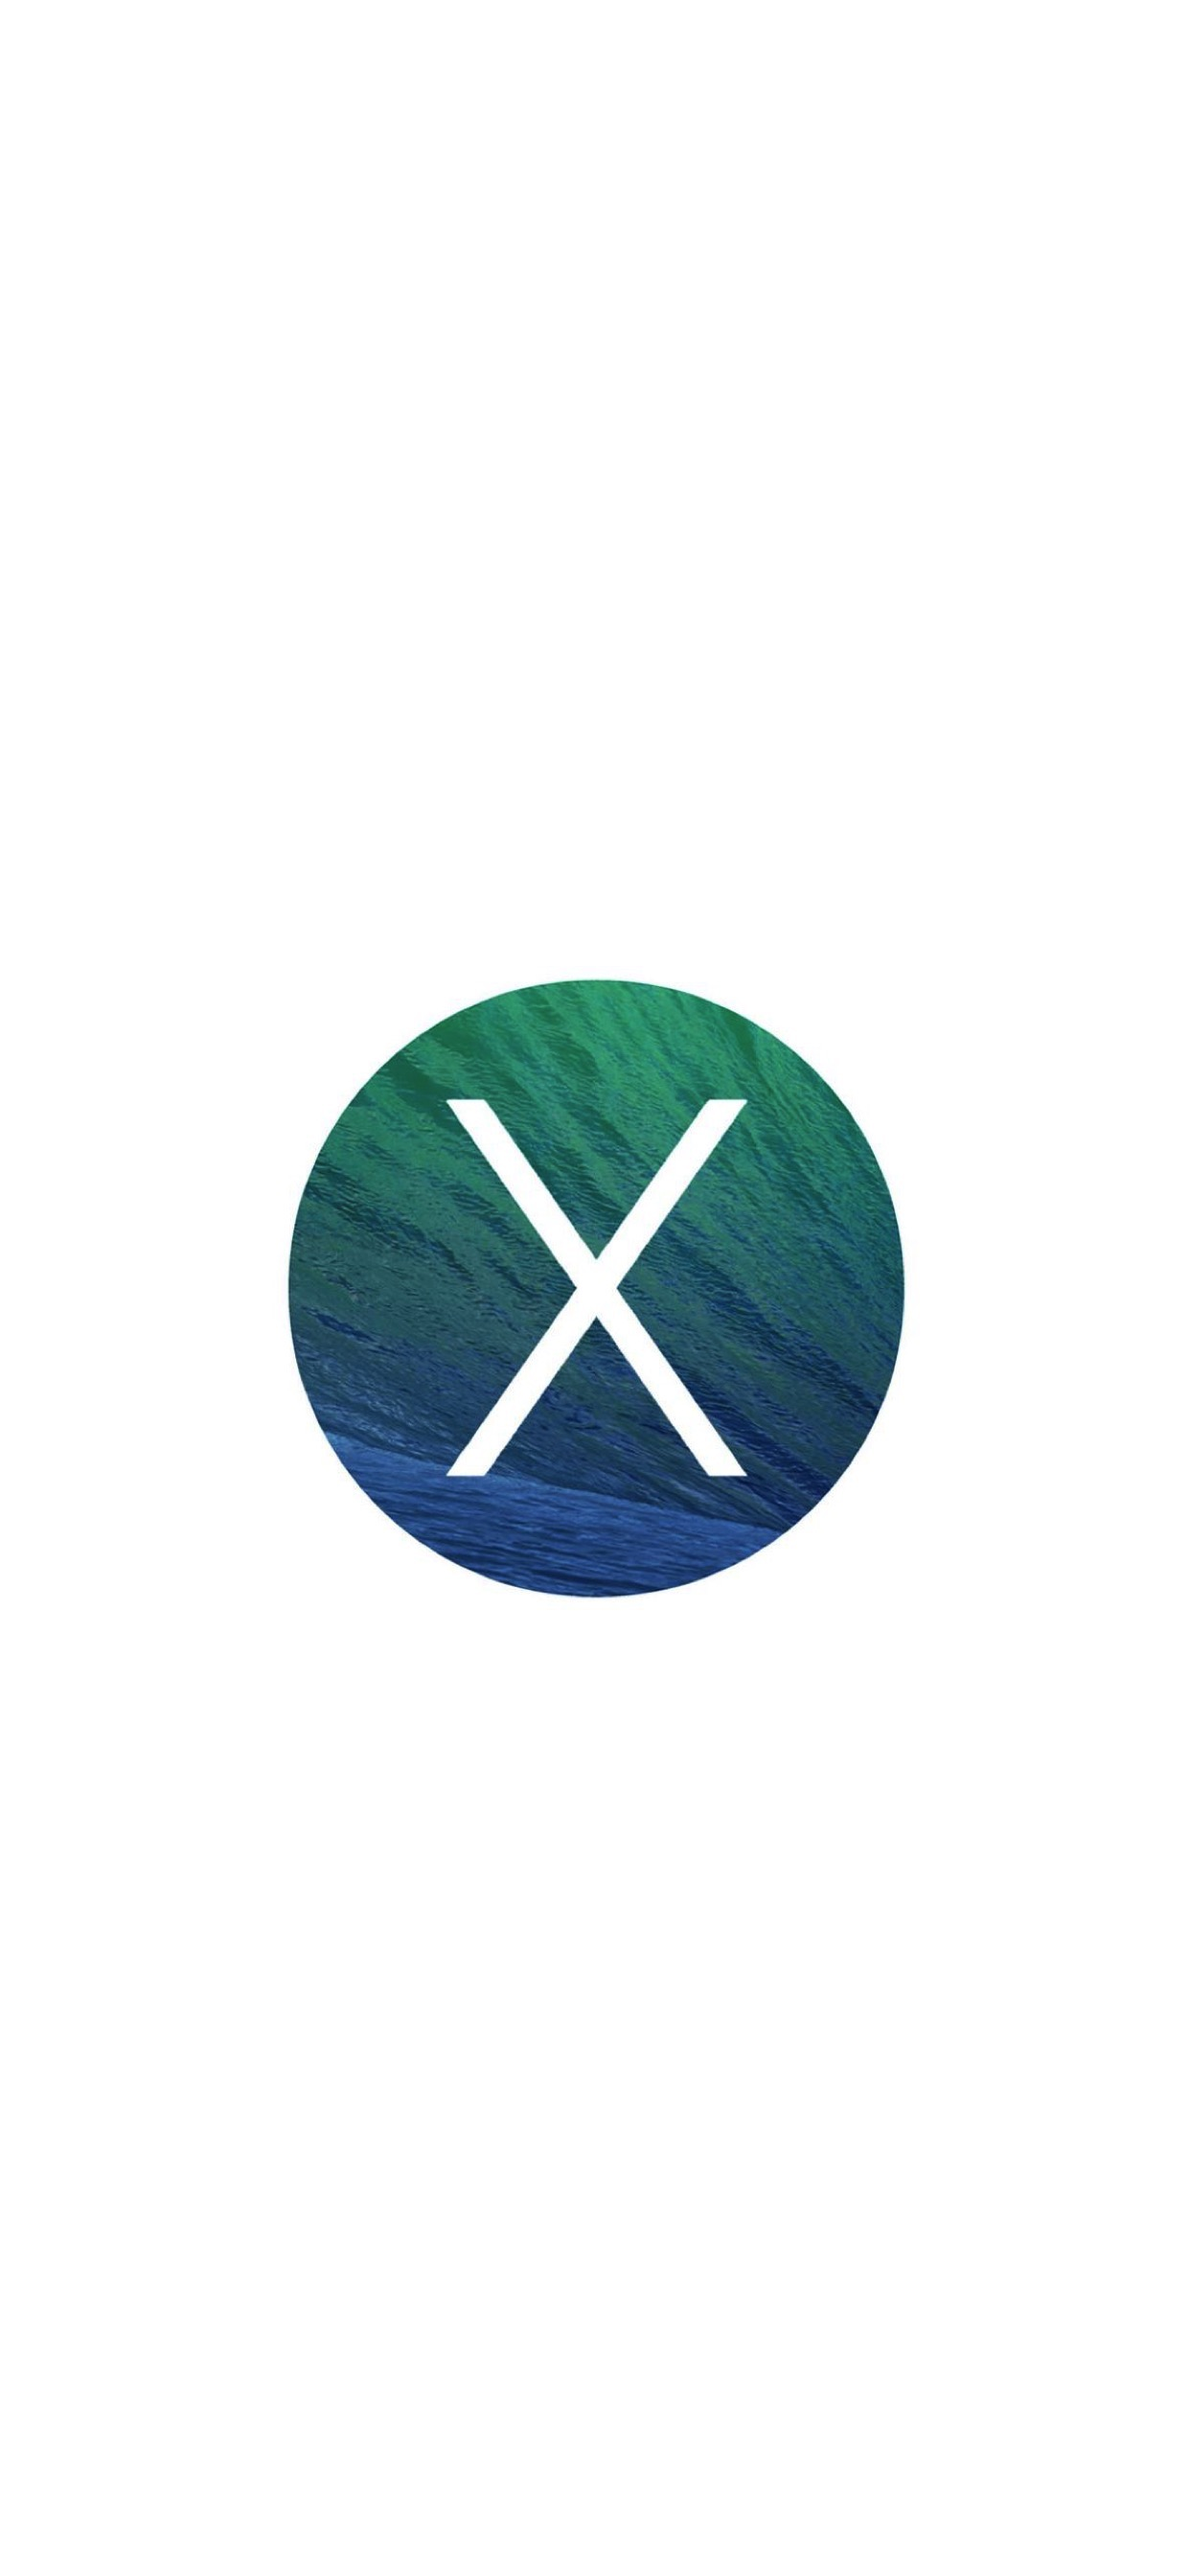 iPhone XS Max 壁紙 wallpaper 0415